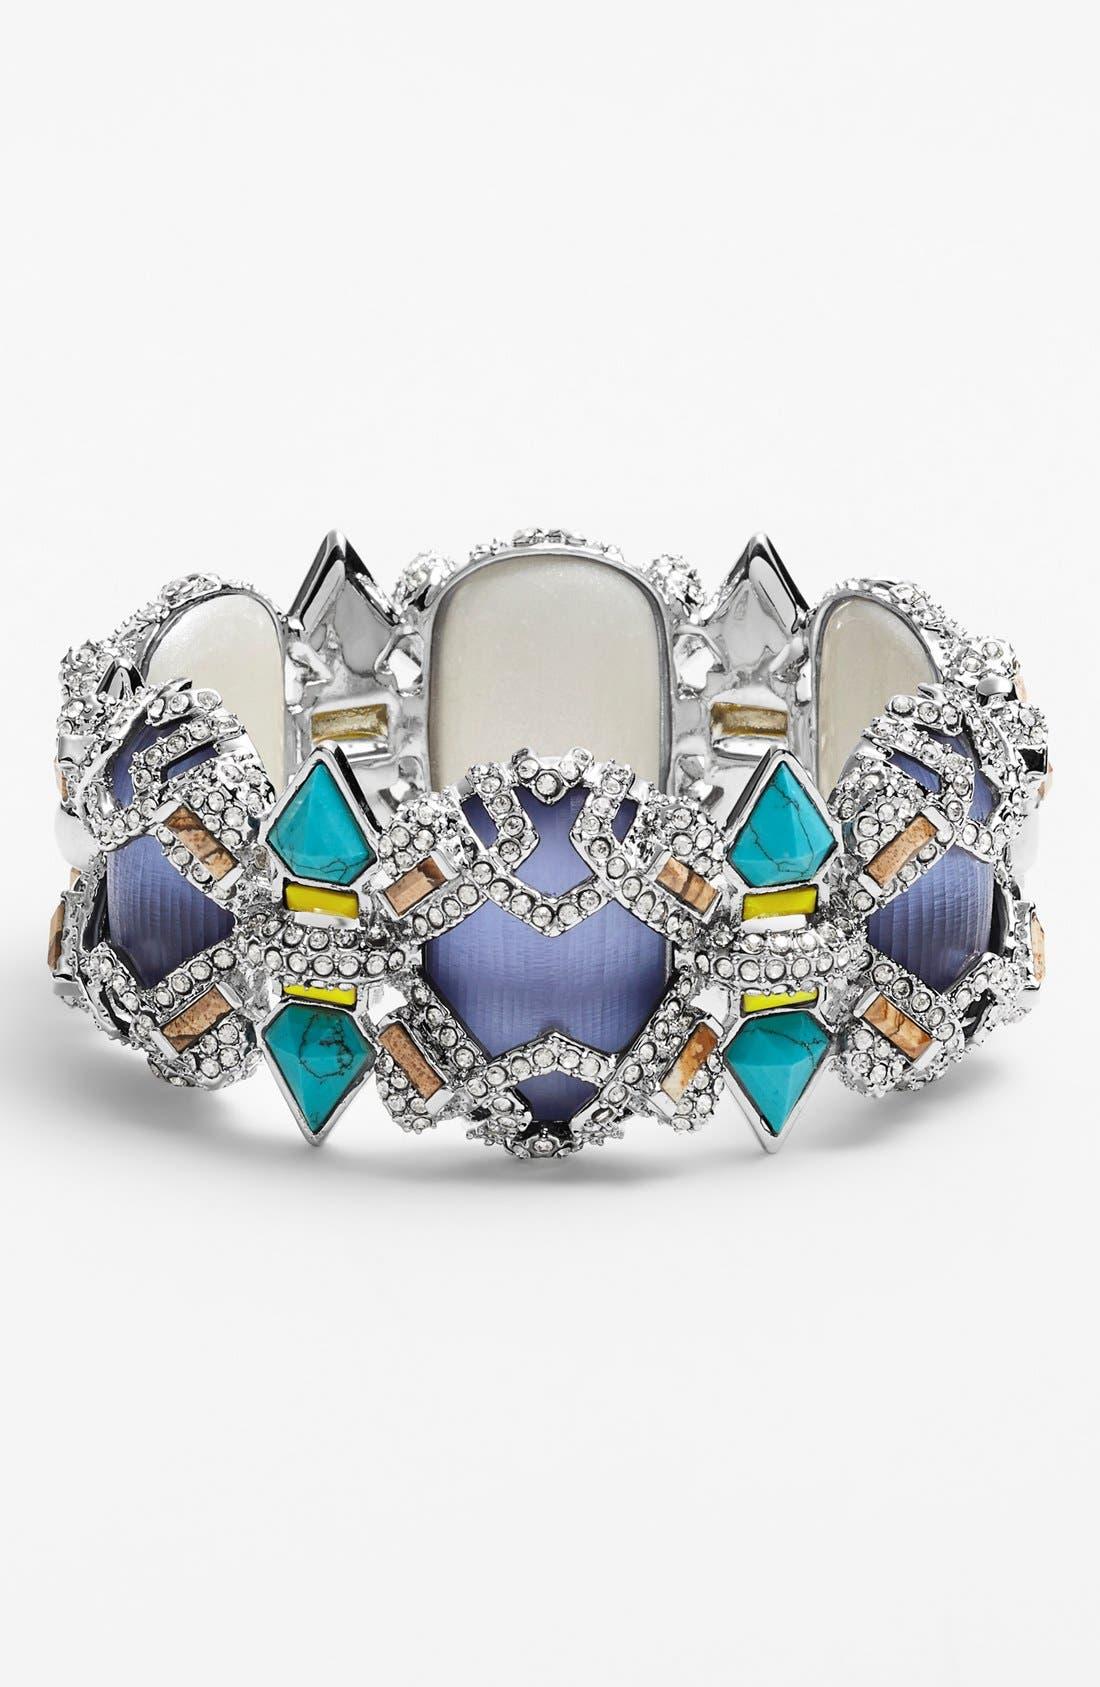 Alternate Image 1 Selected - Alexis Bittar 'Lucite® - Neon Deco' Wide Bracelet